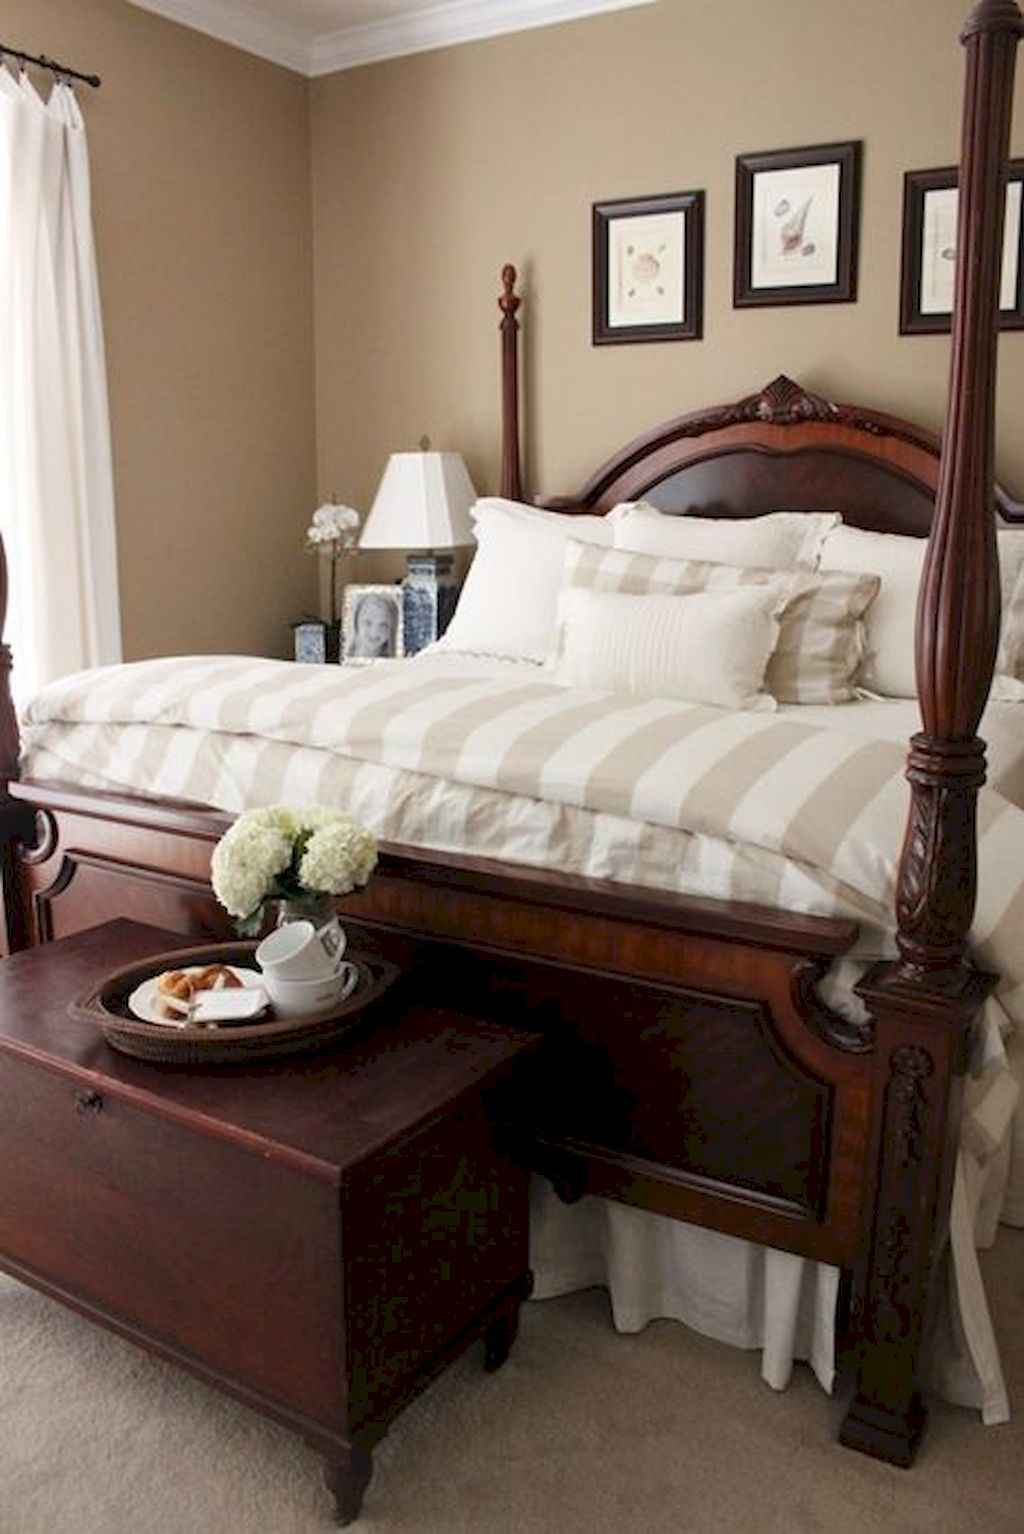 Incredible master bedroom ideas (53)